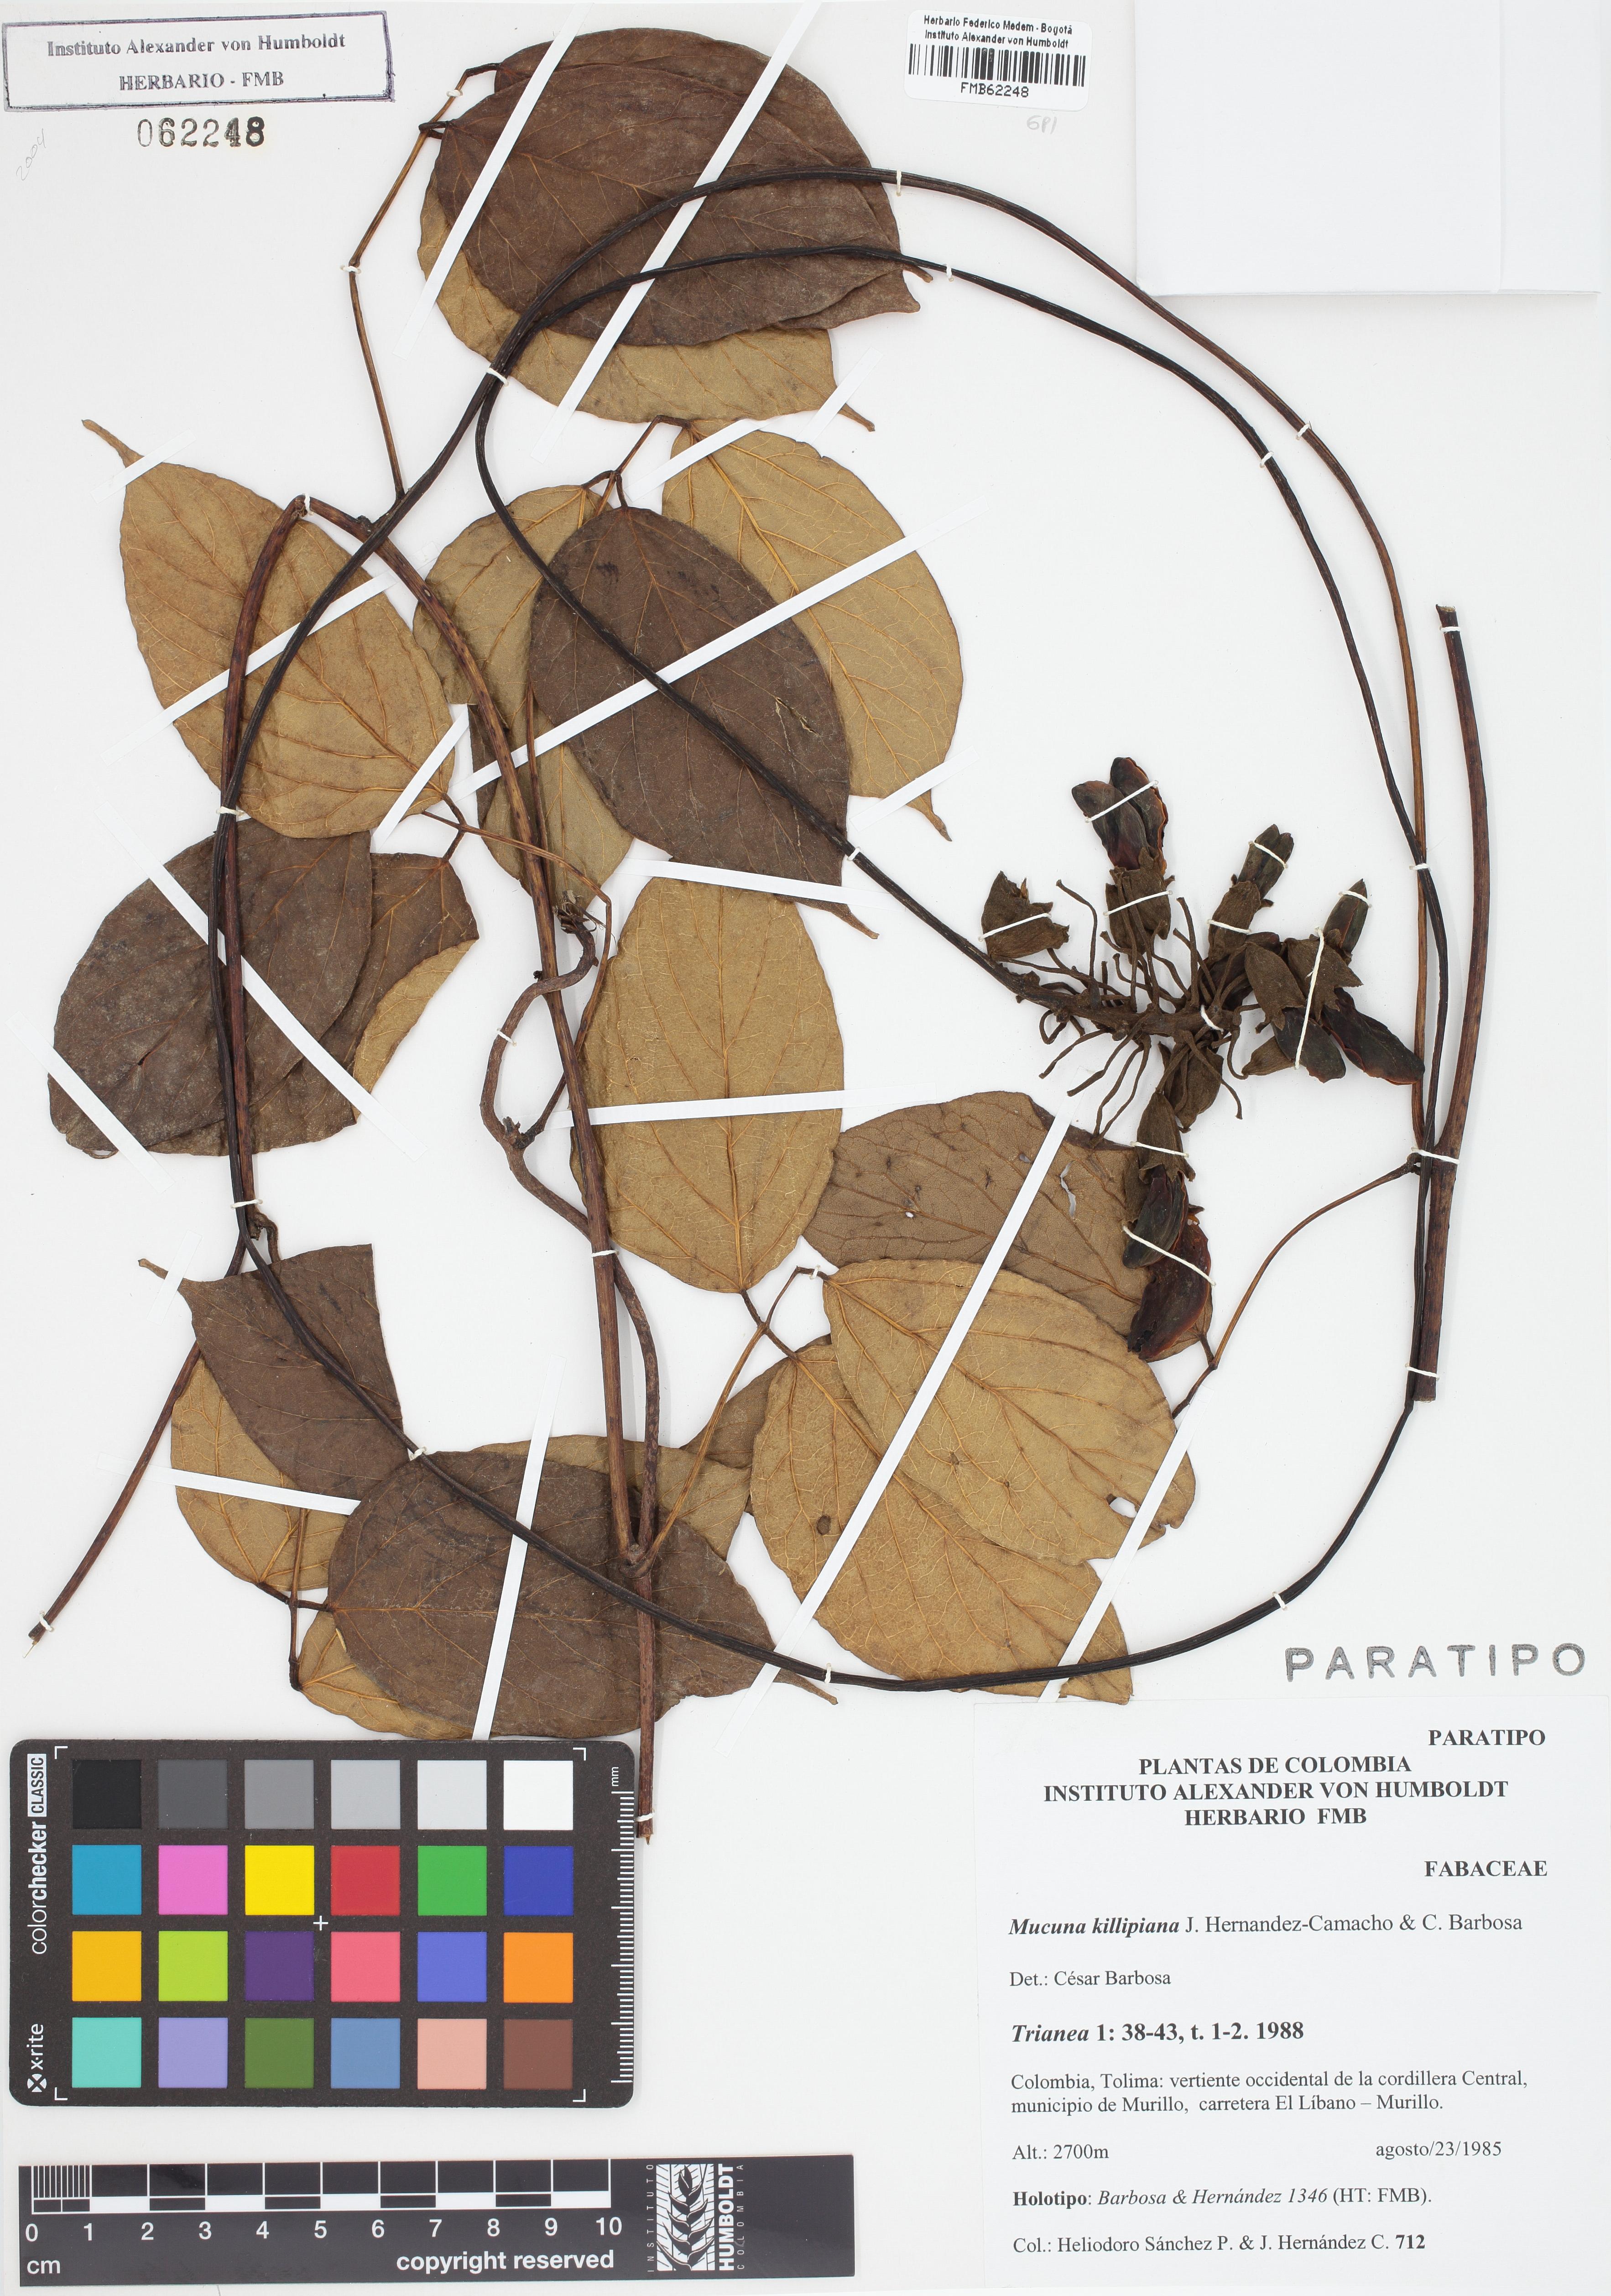 Paratipo de <em>Mucuna killipiana</em>, FMB-62248, Fotografía por Robles A.